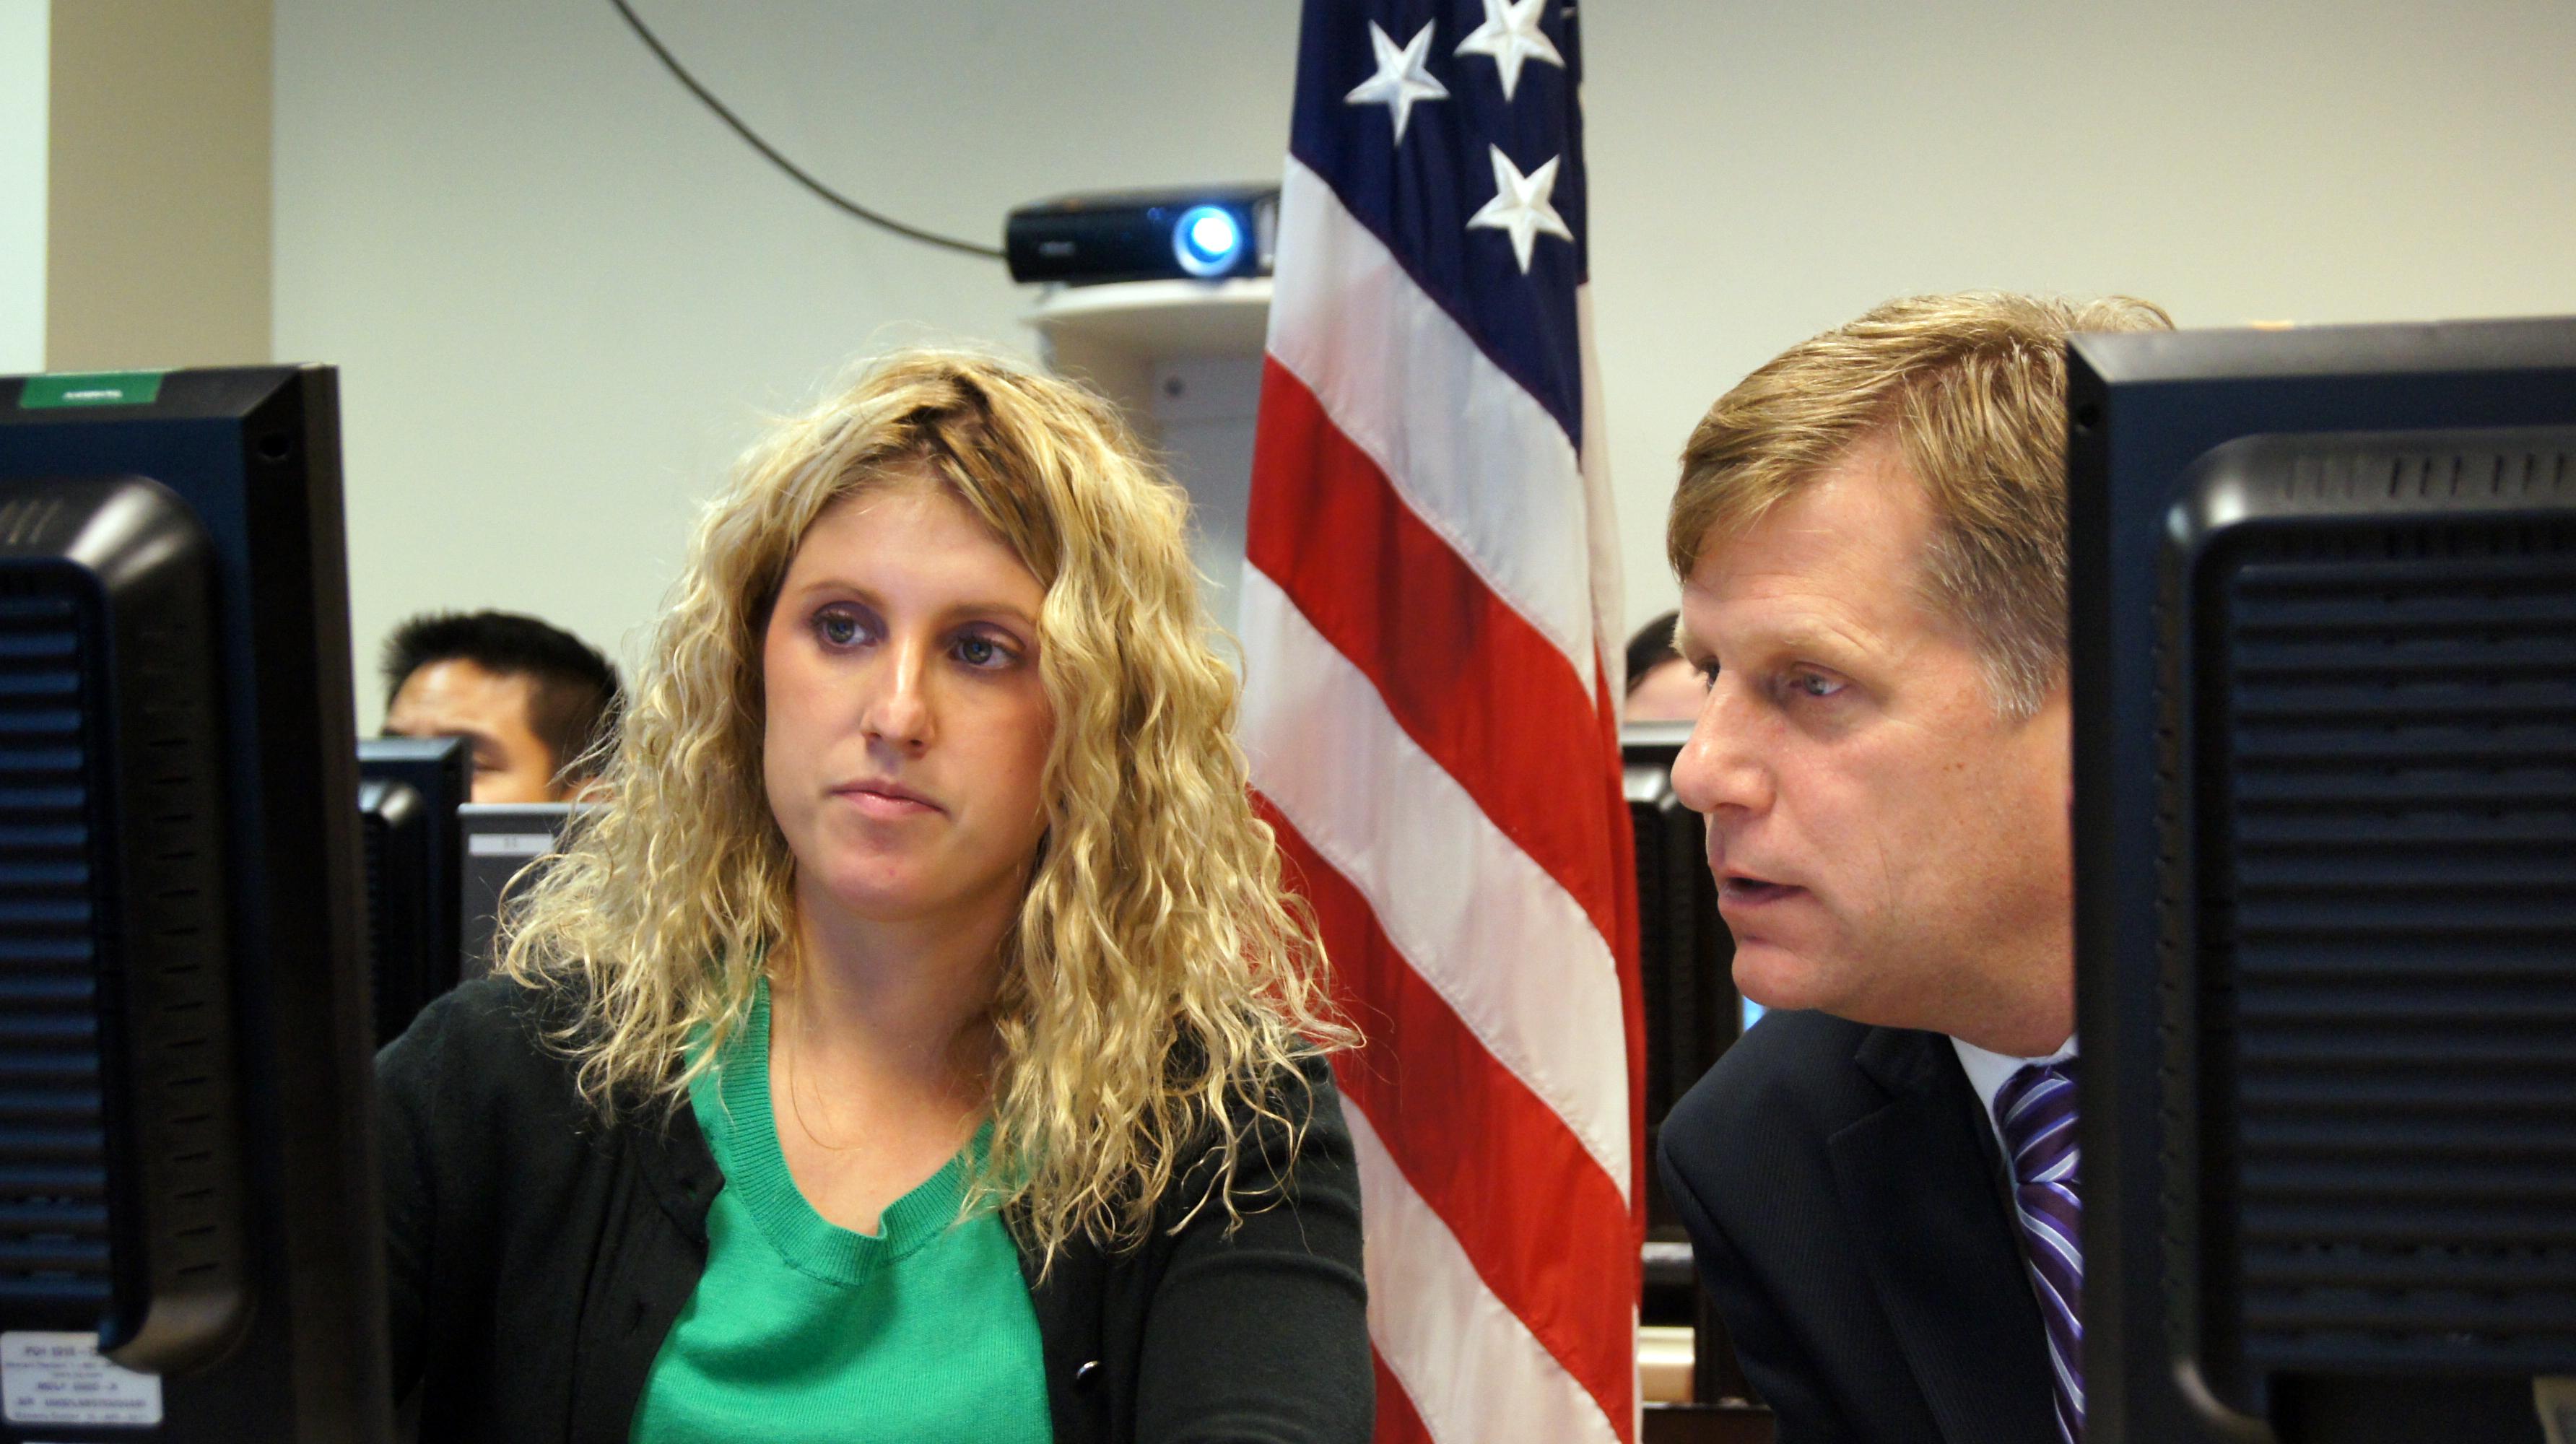 File:Ambassador McFaul Participates in a Twitter Q&A (1) jpg